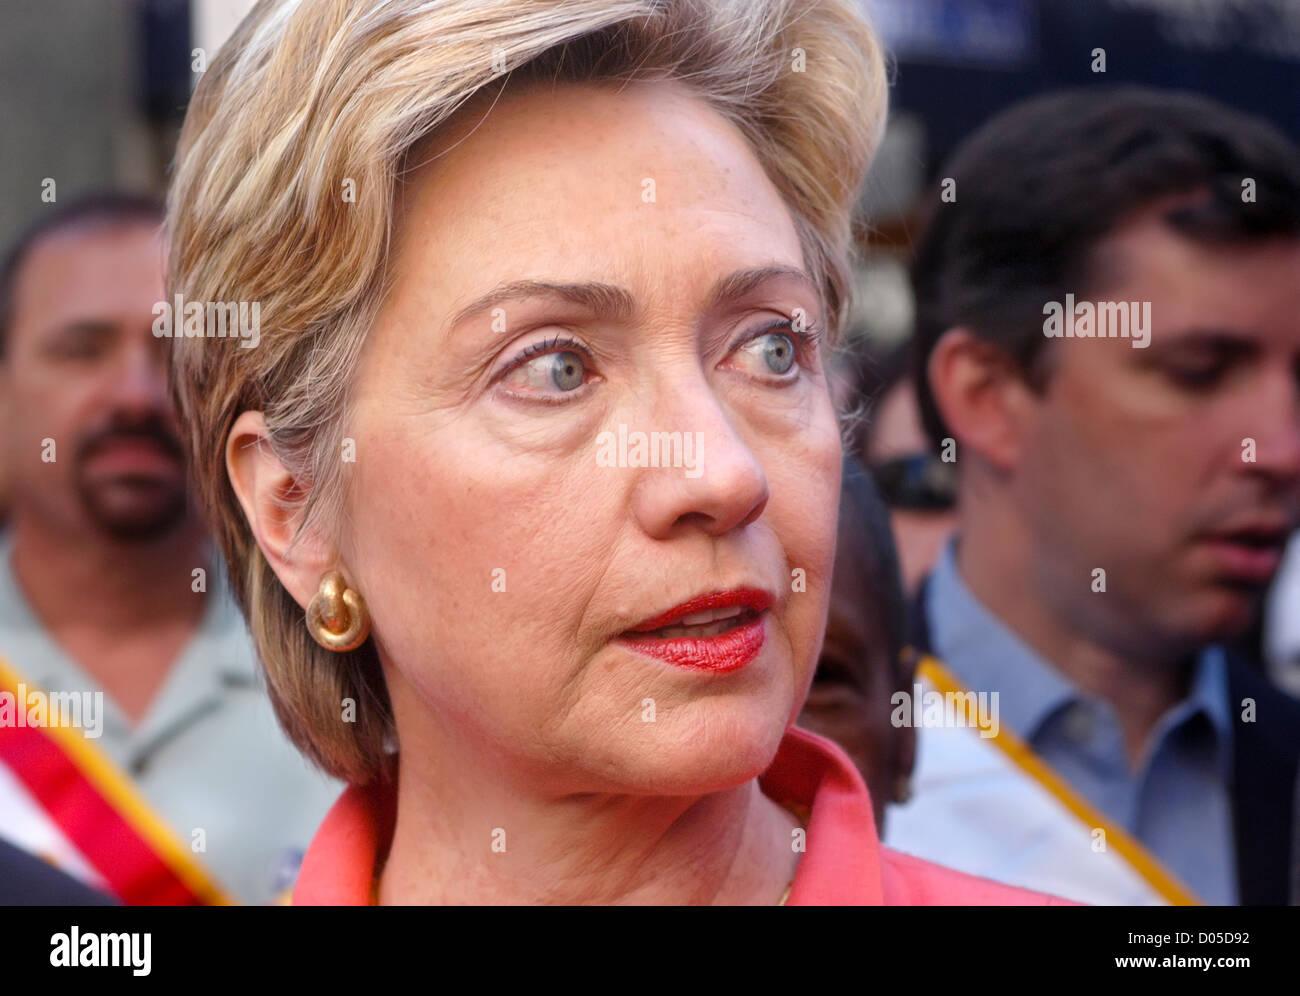 Senator Hillary Rodham Clinton am Labor Day Parade. © Stacy Walsh Rosenstock Stockbild